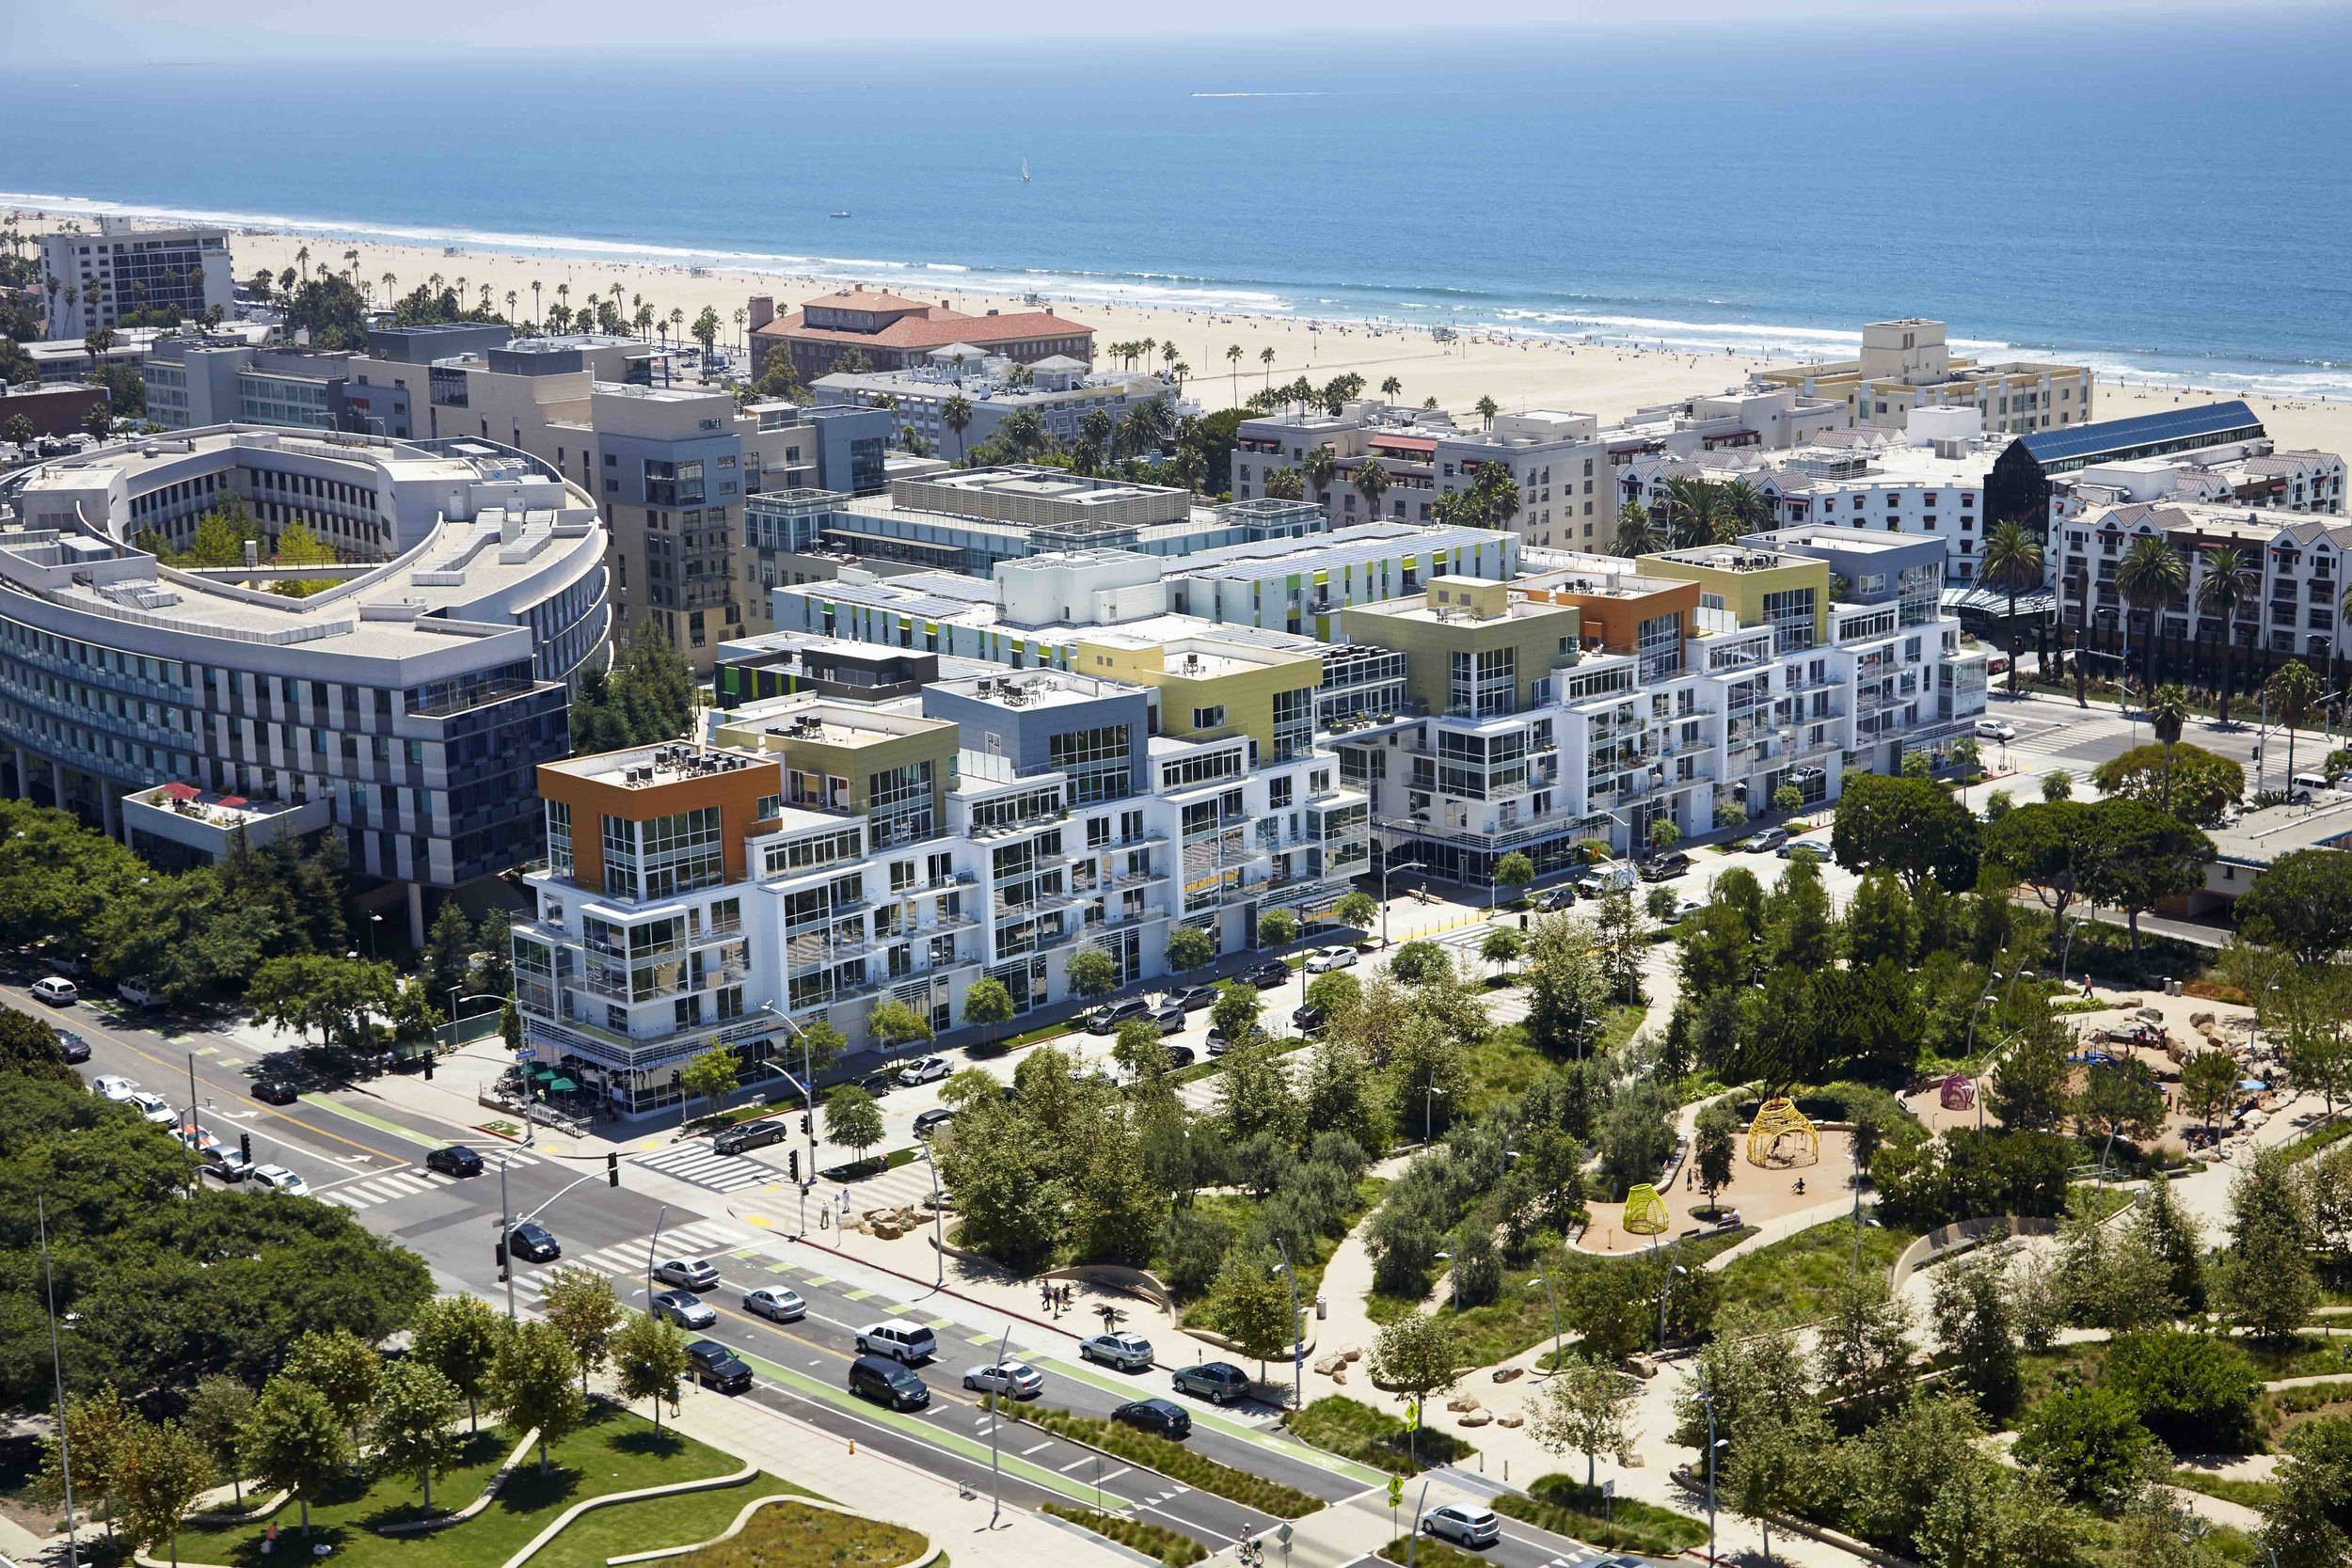 The Village at Santa Monica